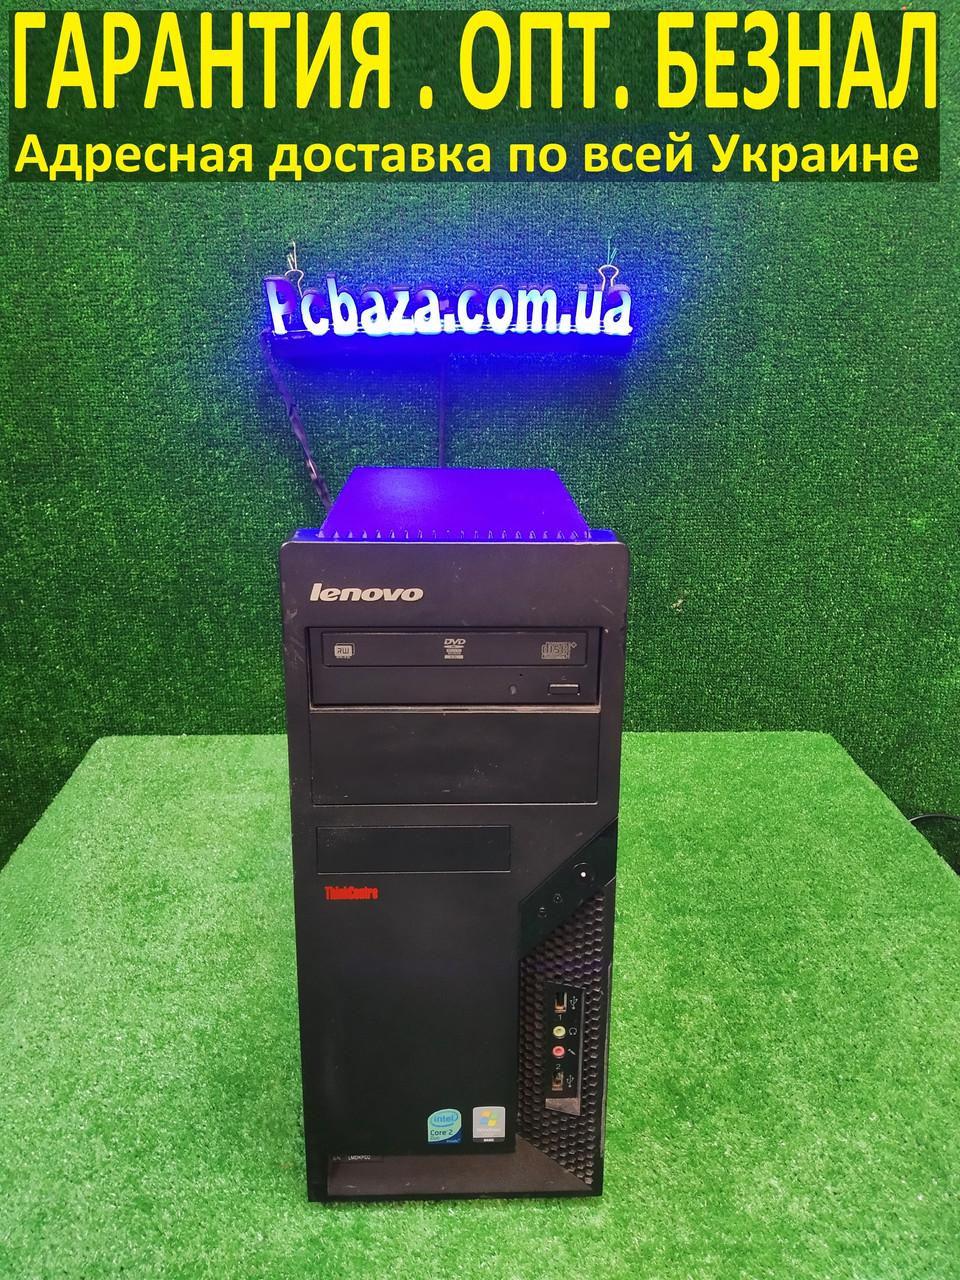 Компьютер Lenovo, 2 ядра Intel e6600 2.4 Ггц, 2 Гб ОЗУ, 160 ГБ HDD Настроен, подключай и пользуйся!